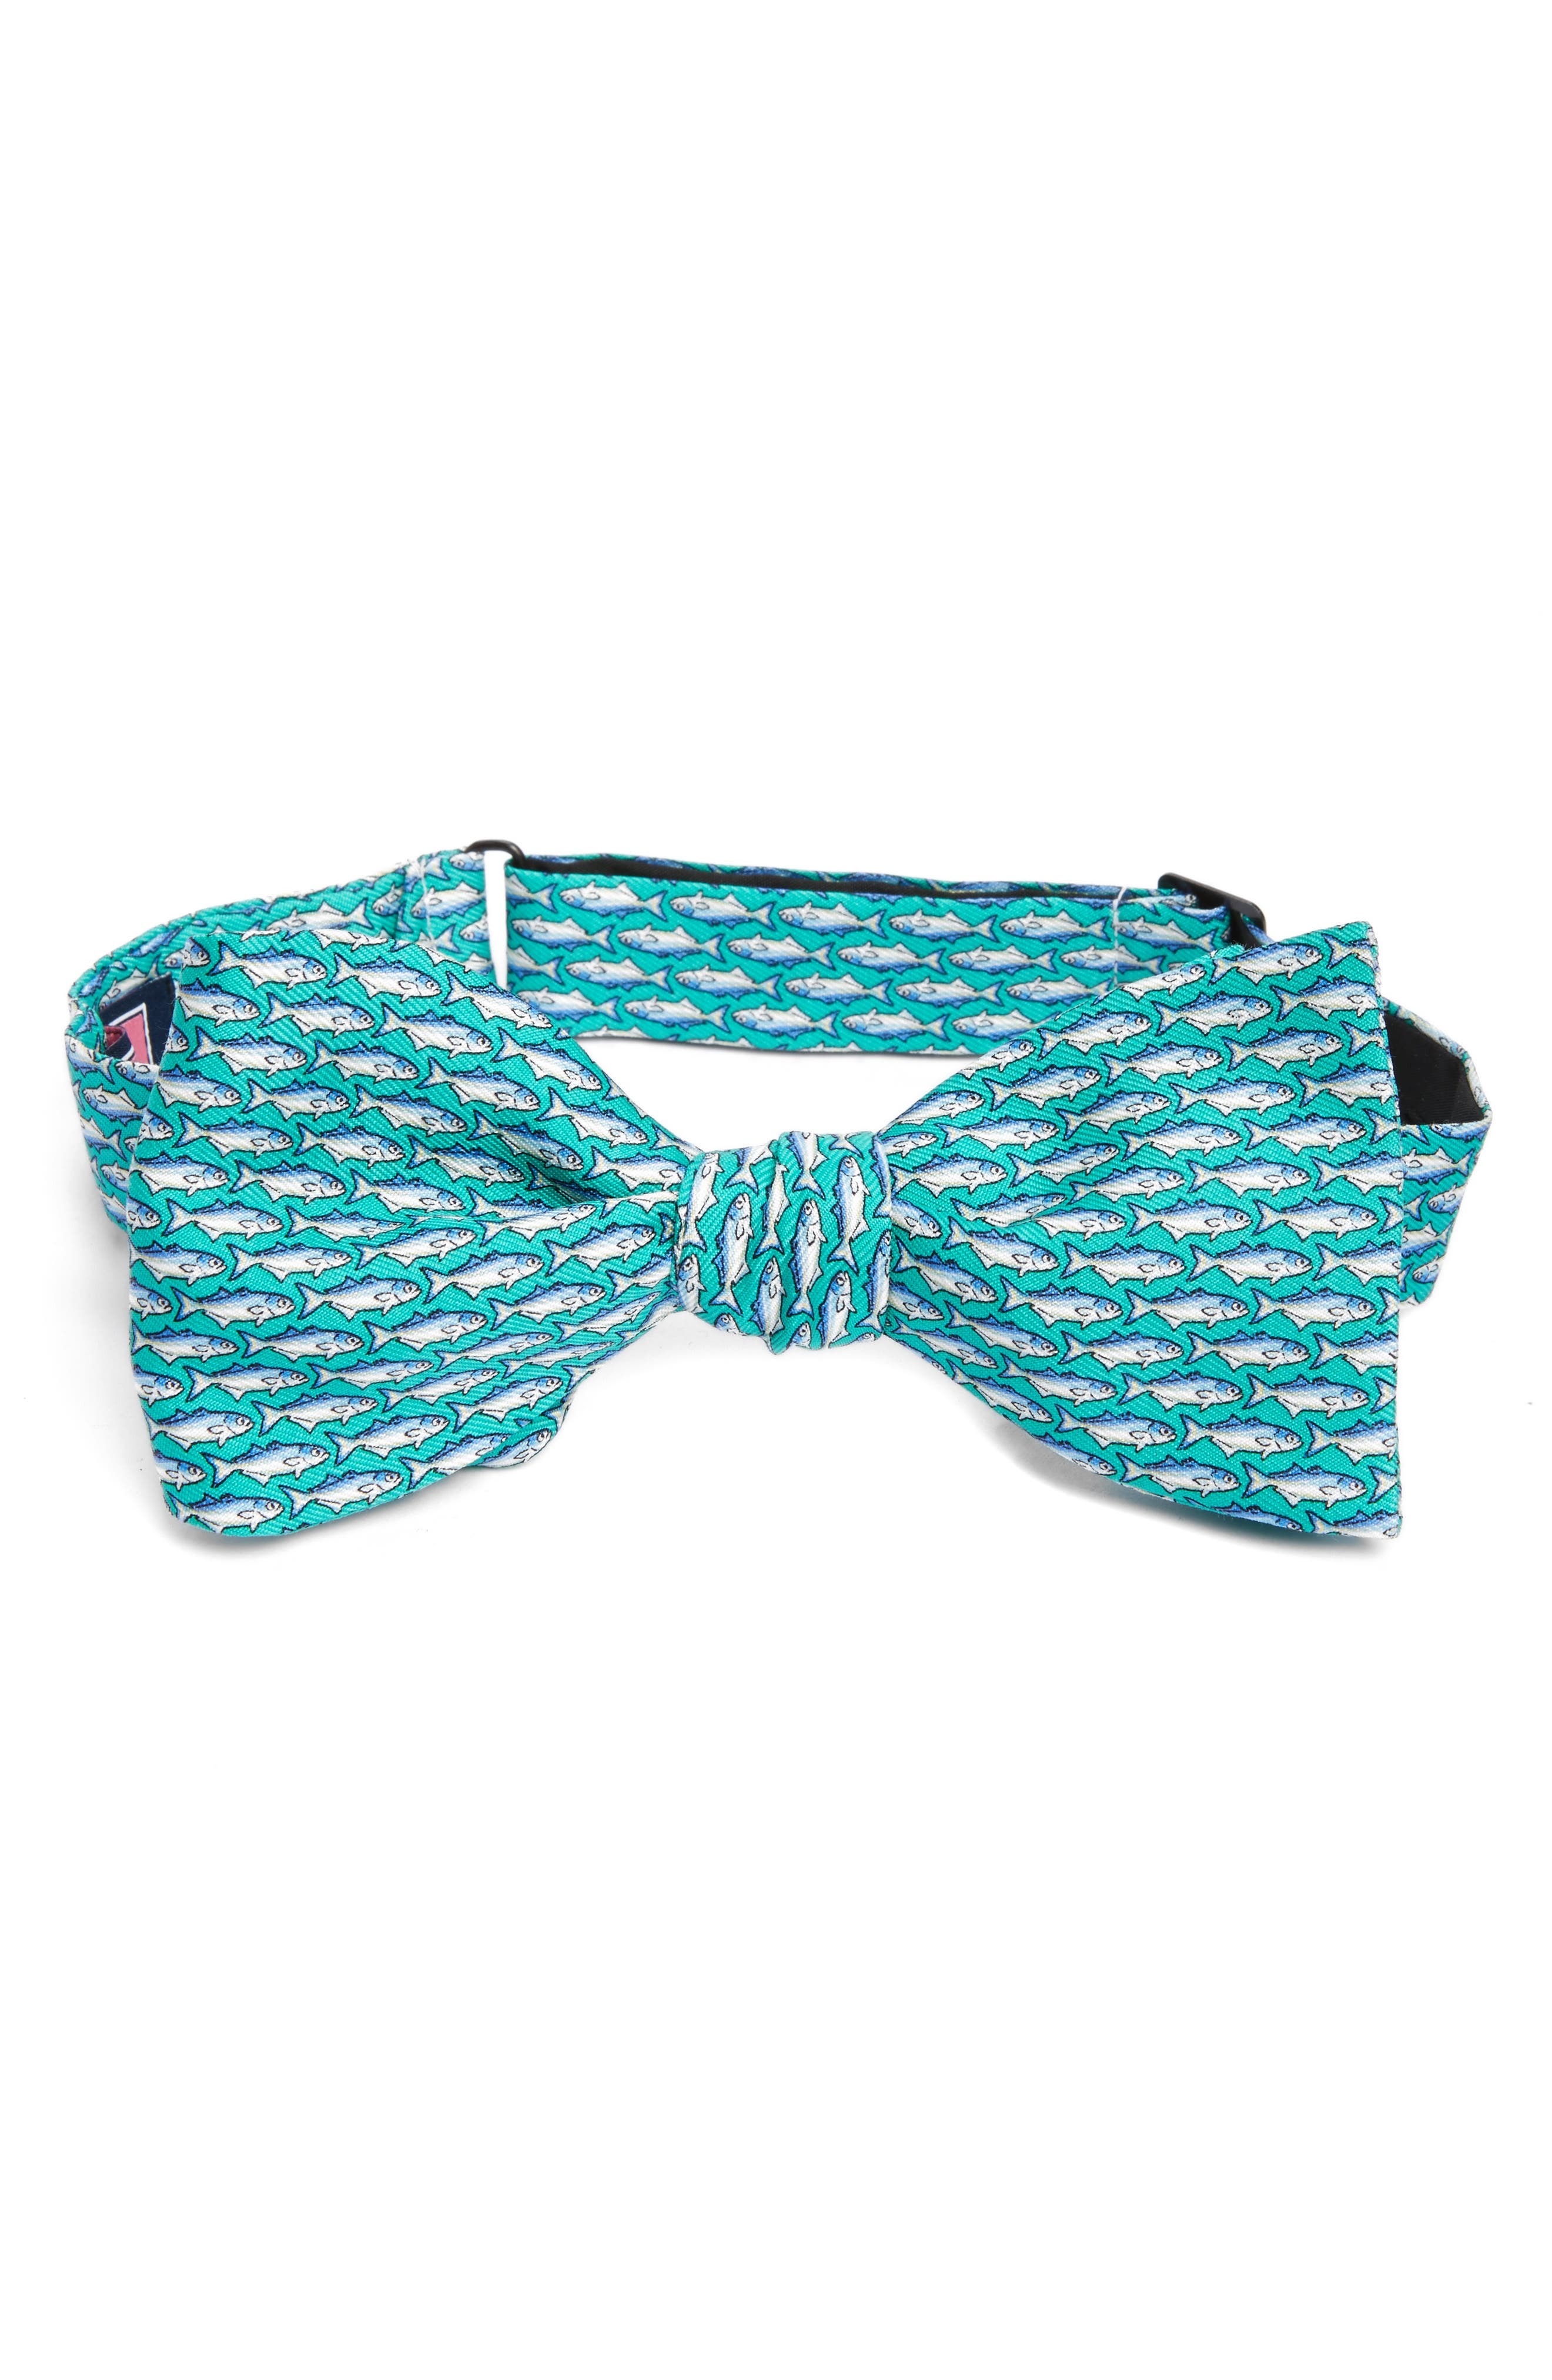 Blue Fish Print Silk Bow Tie,                             Main thumbnail 1, color,                             Aqua